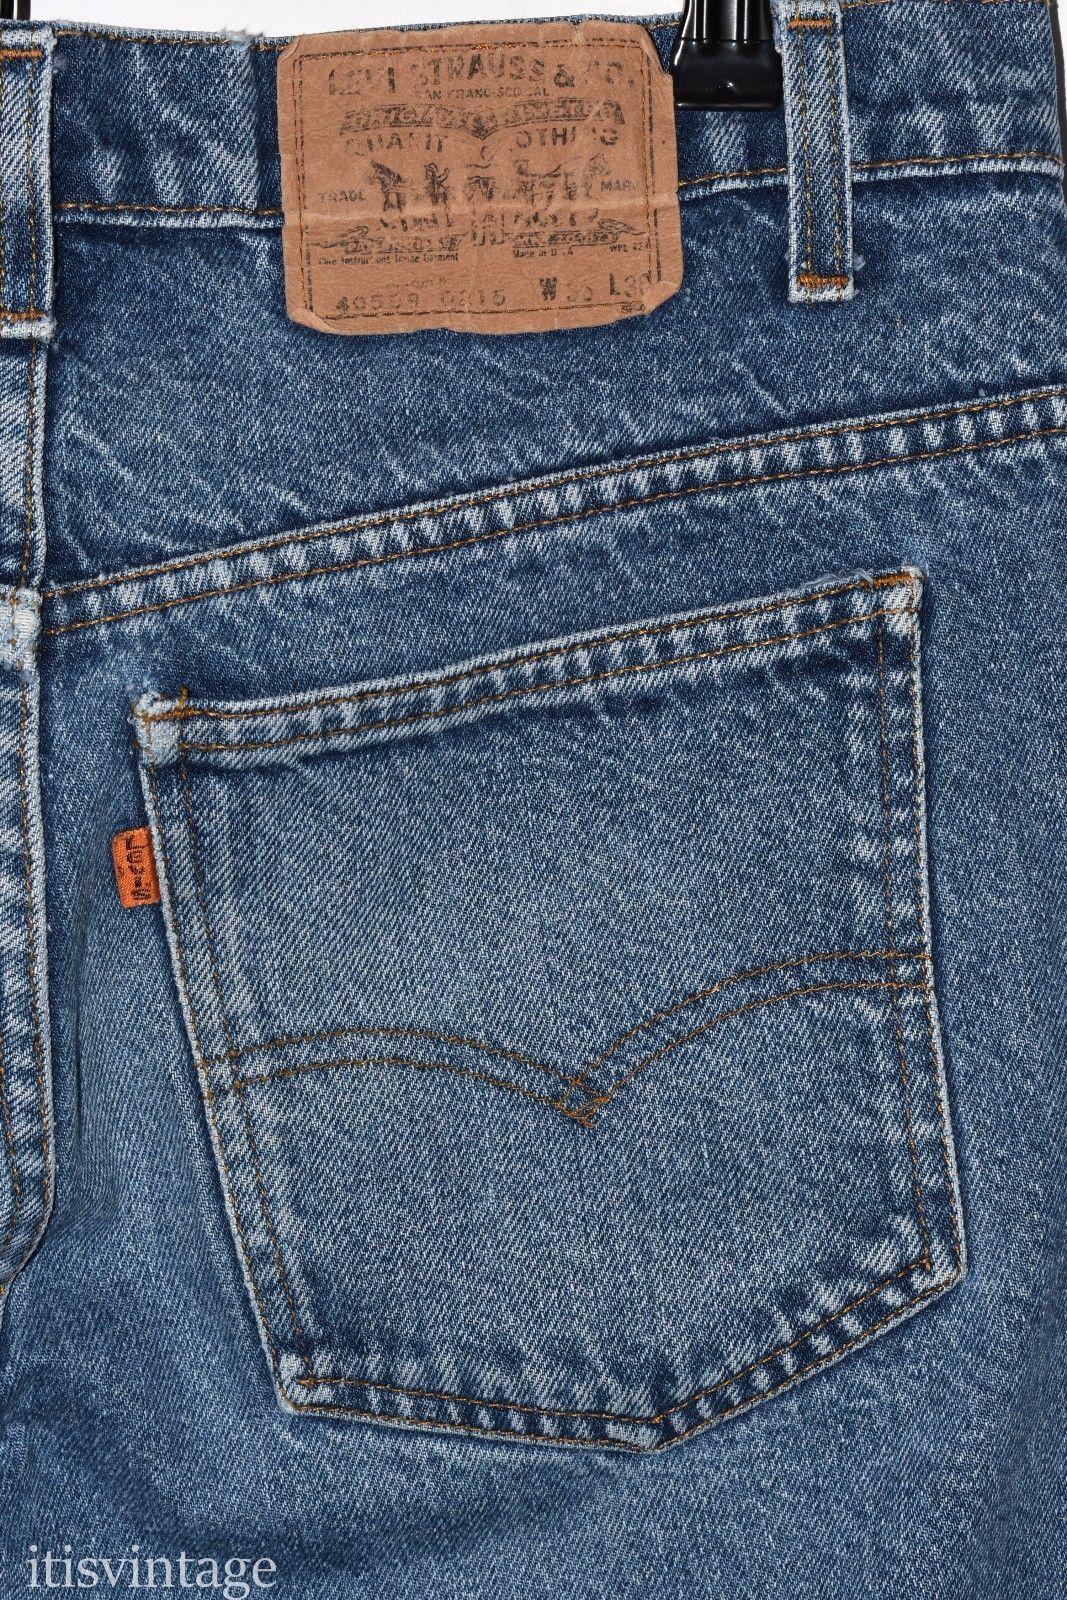 e76146db Vintage 80's Levi's 509 Straight Leg Relaxed Loose Talon 42 Zipper Orange  Tab Denim Jeans 34x28 | Clothing, Shoes & Accessories, Men's Clothing, ...